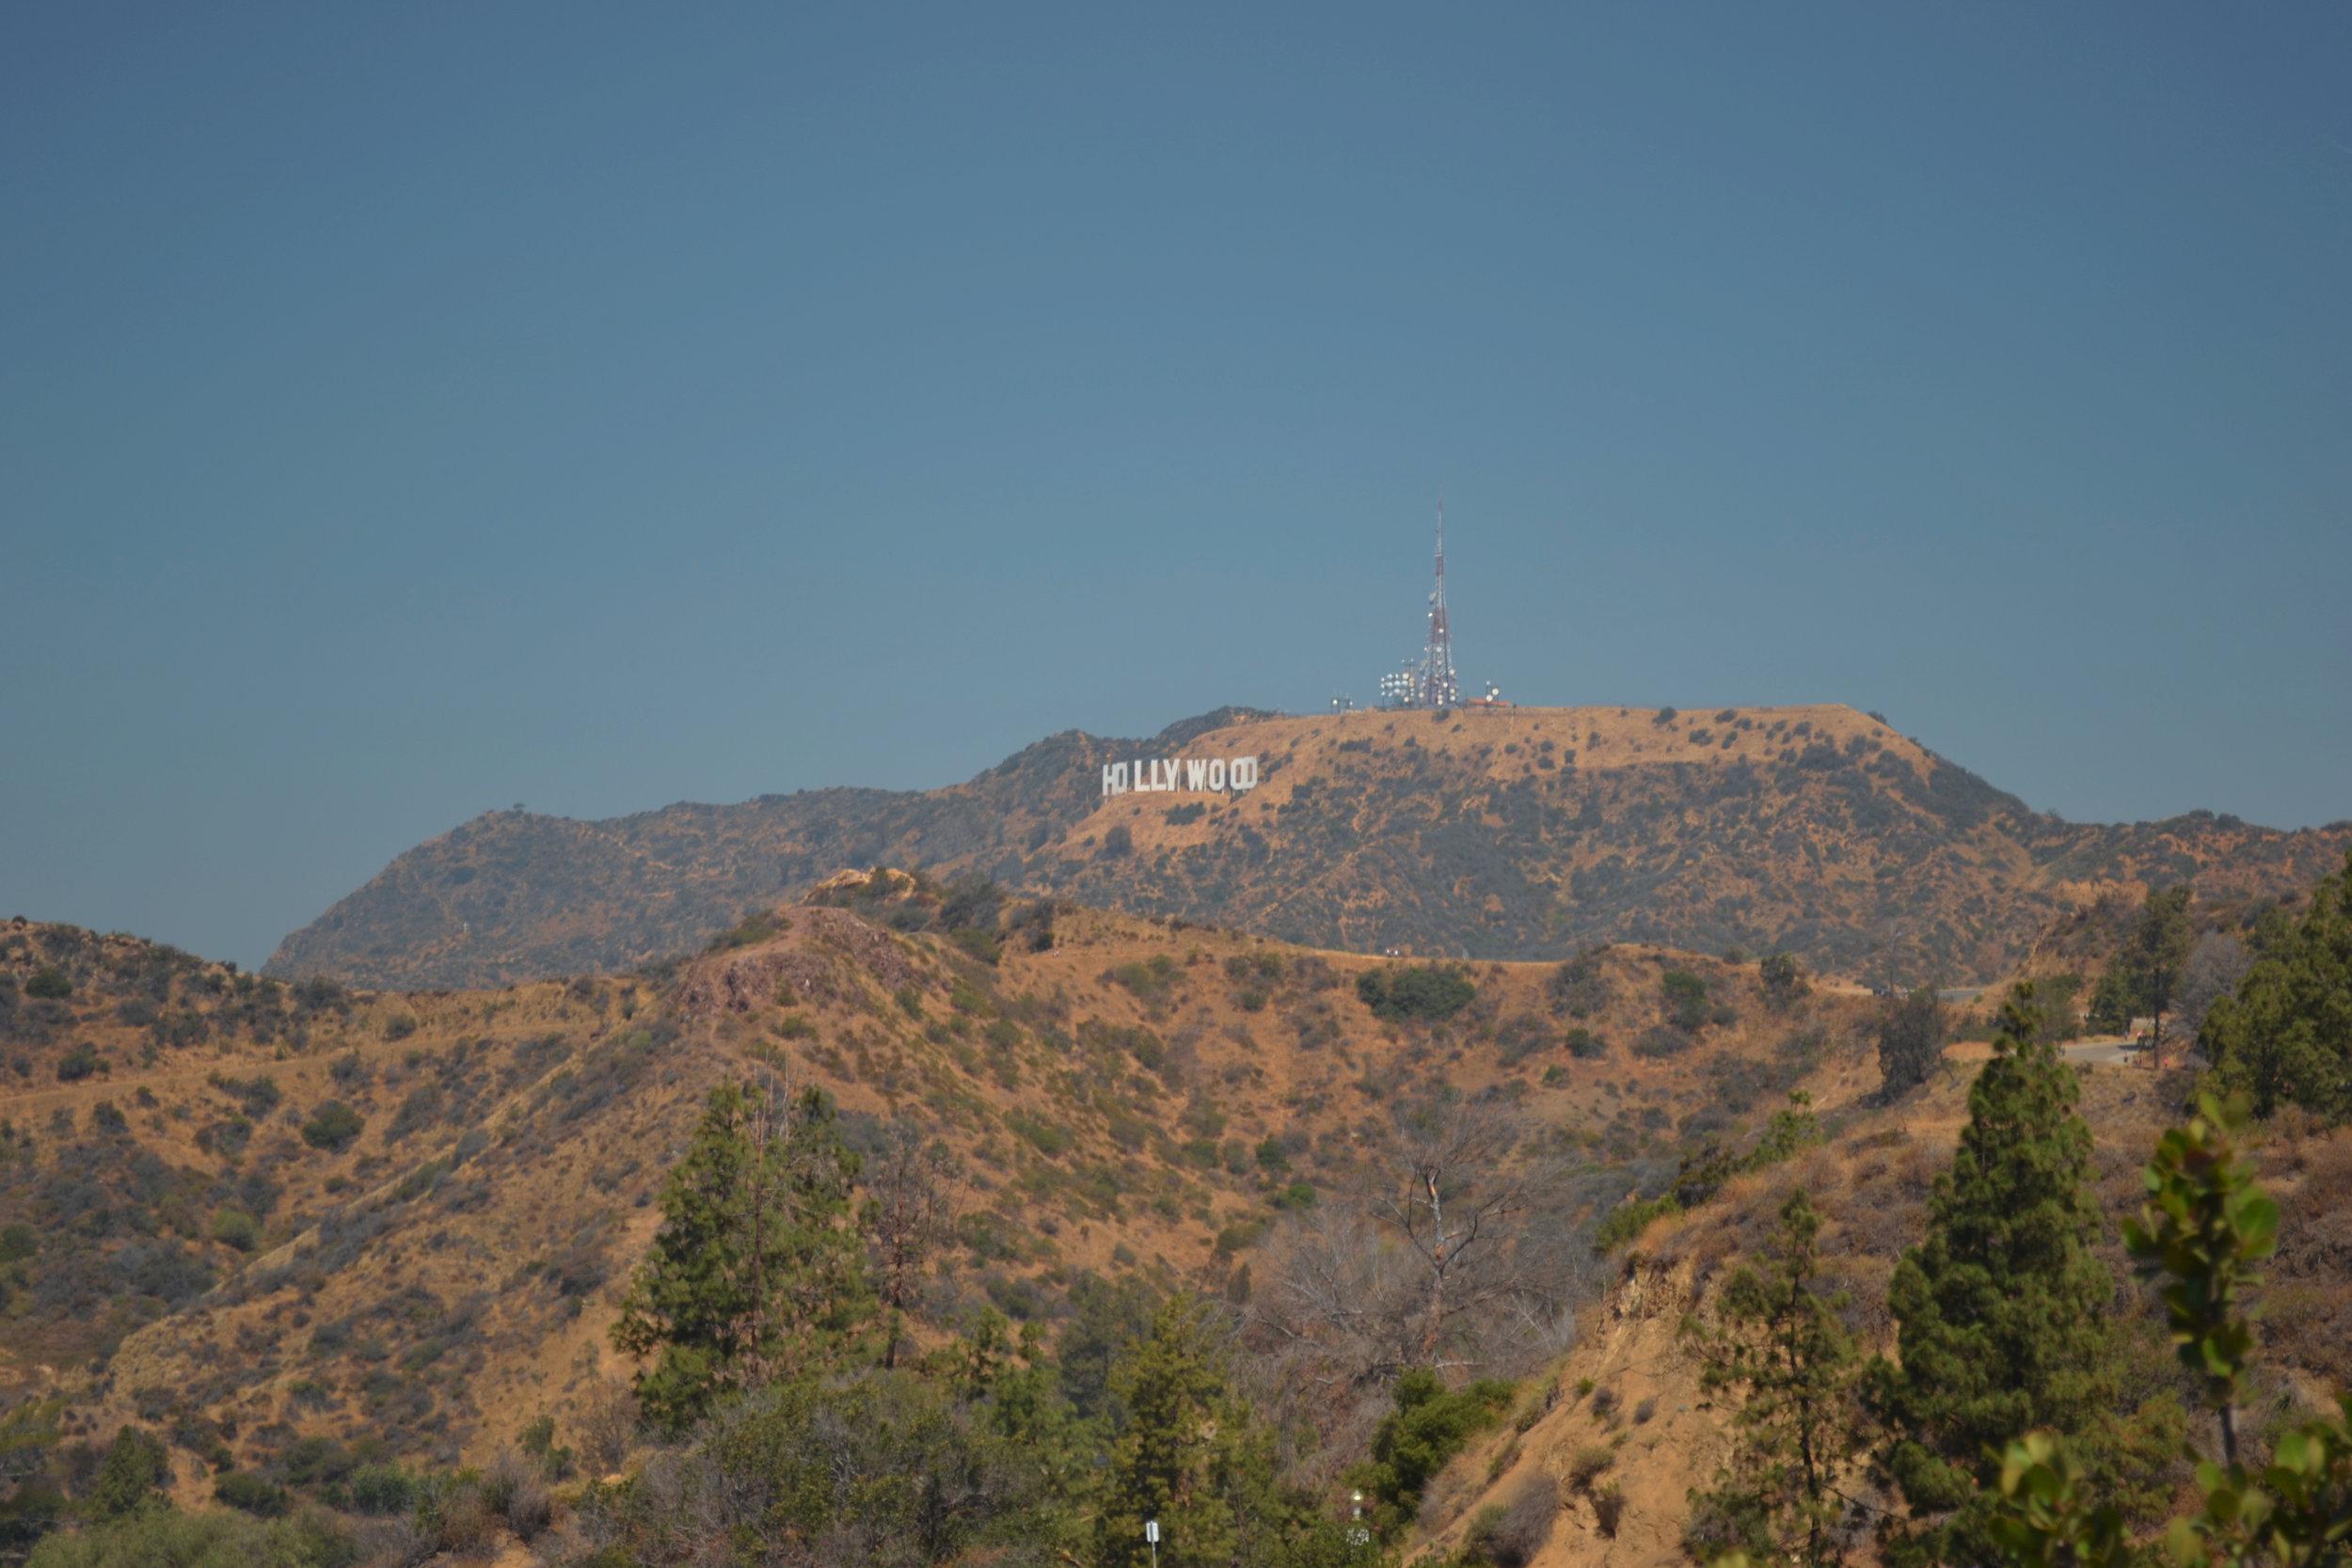 Hollywood. Nikon D3100.